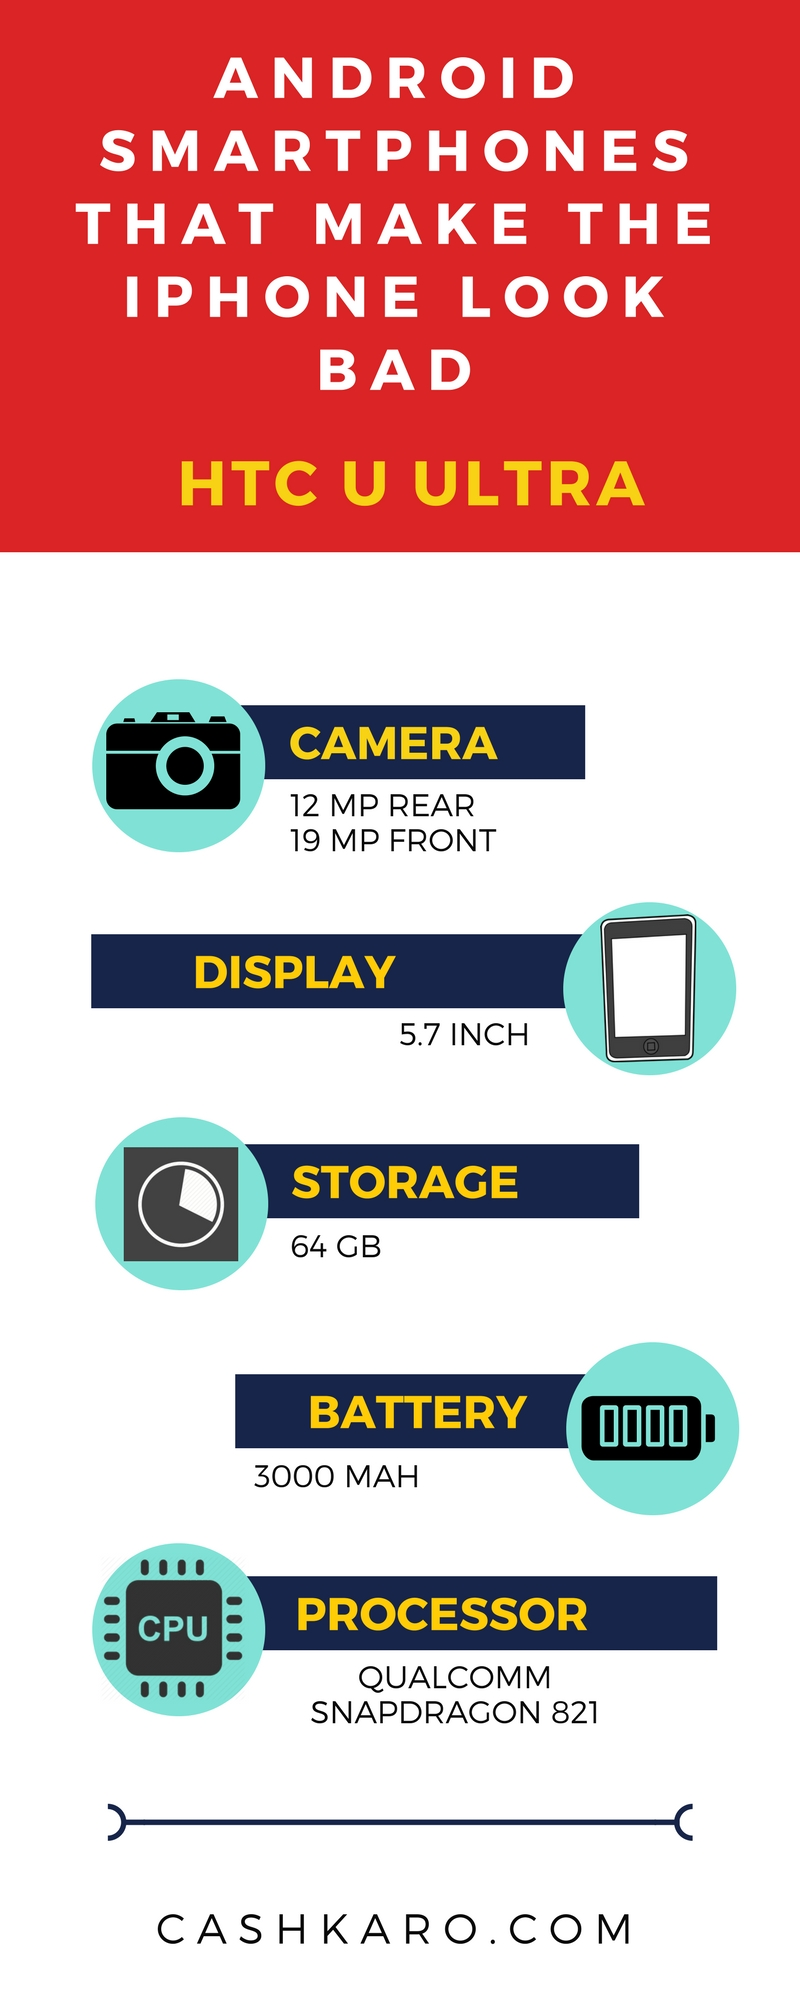 HTC-U-Ultra-infographic